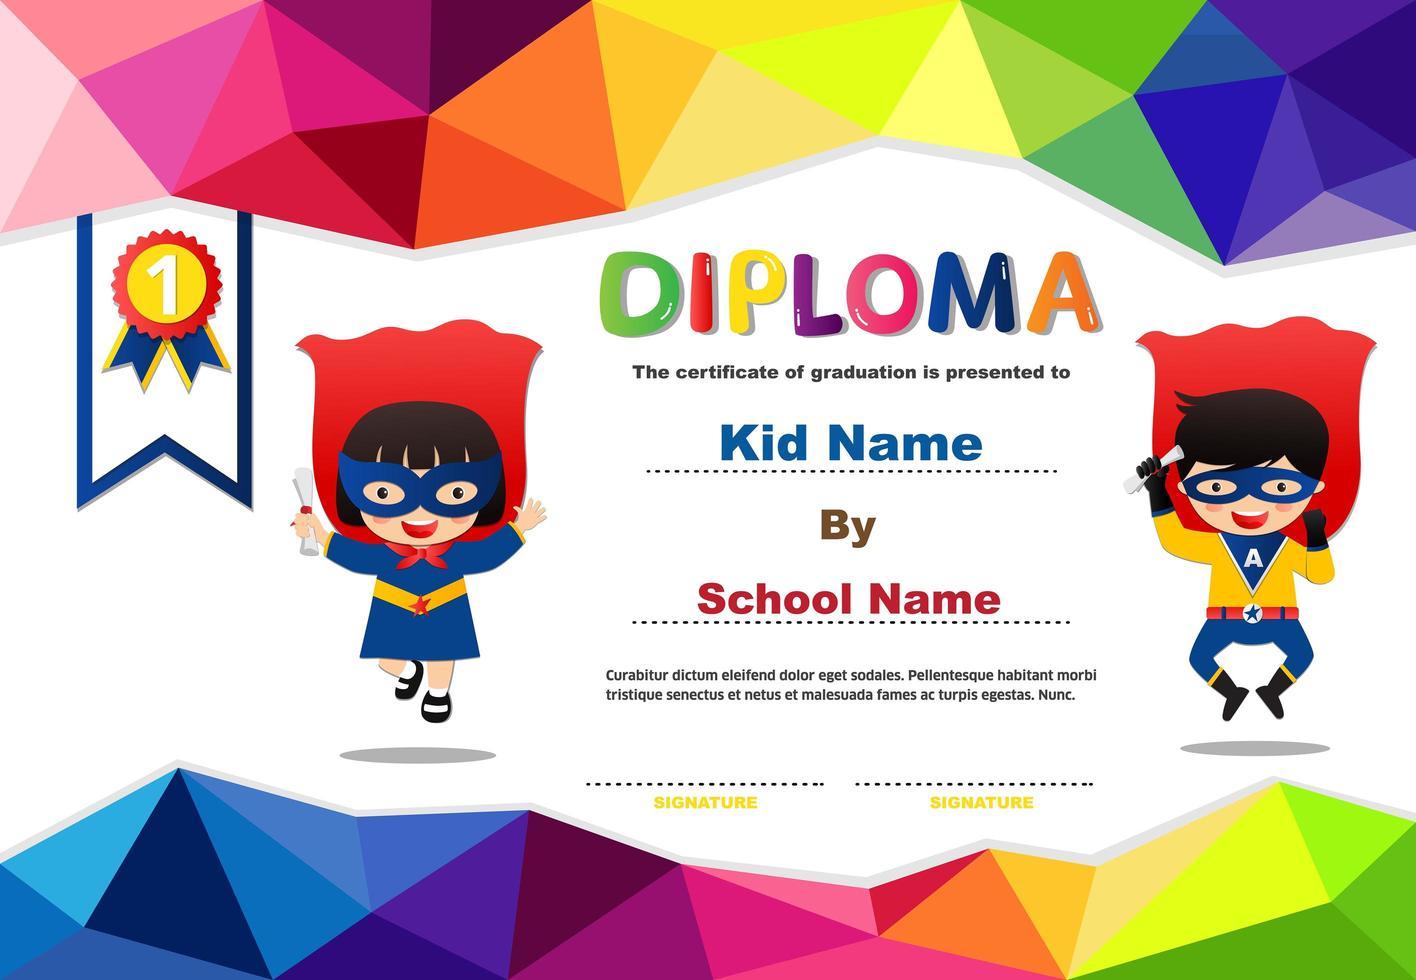 Polygona Vorschule Superhelden Kinder Diplom vektor